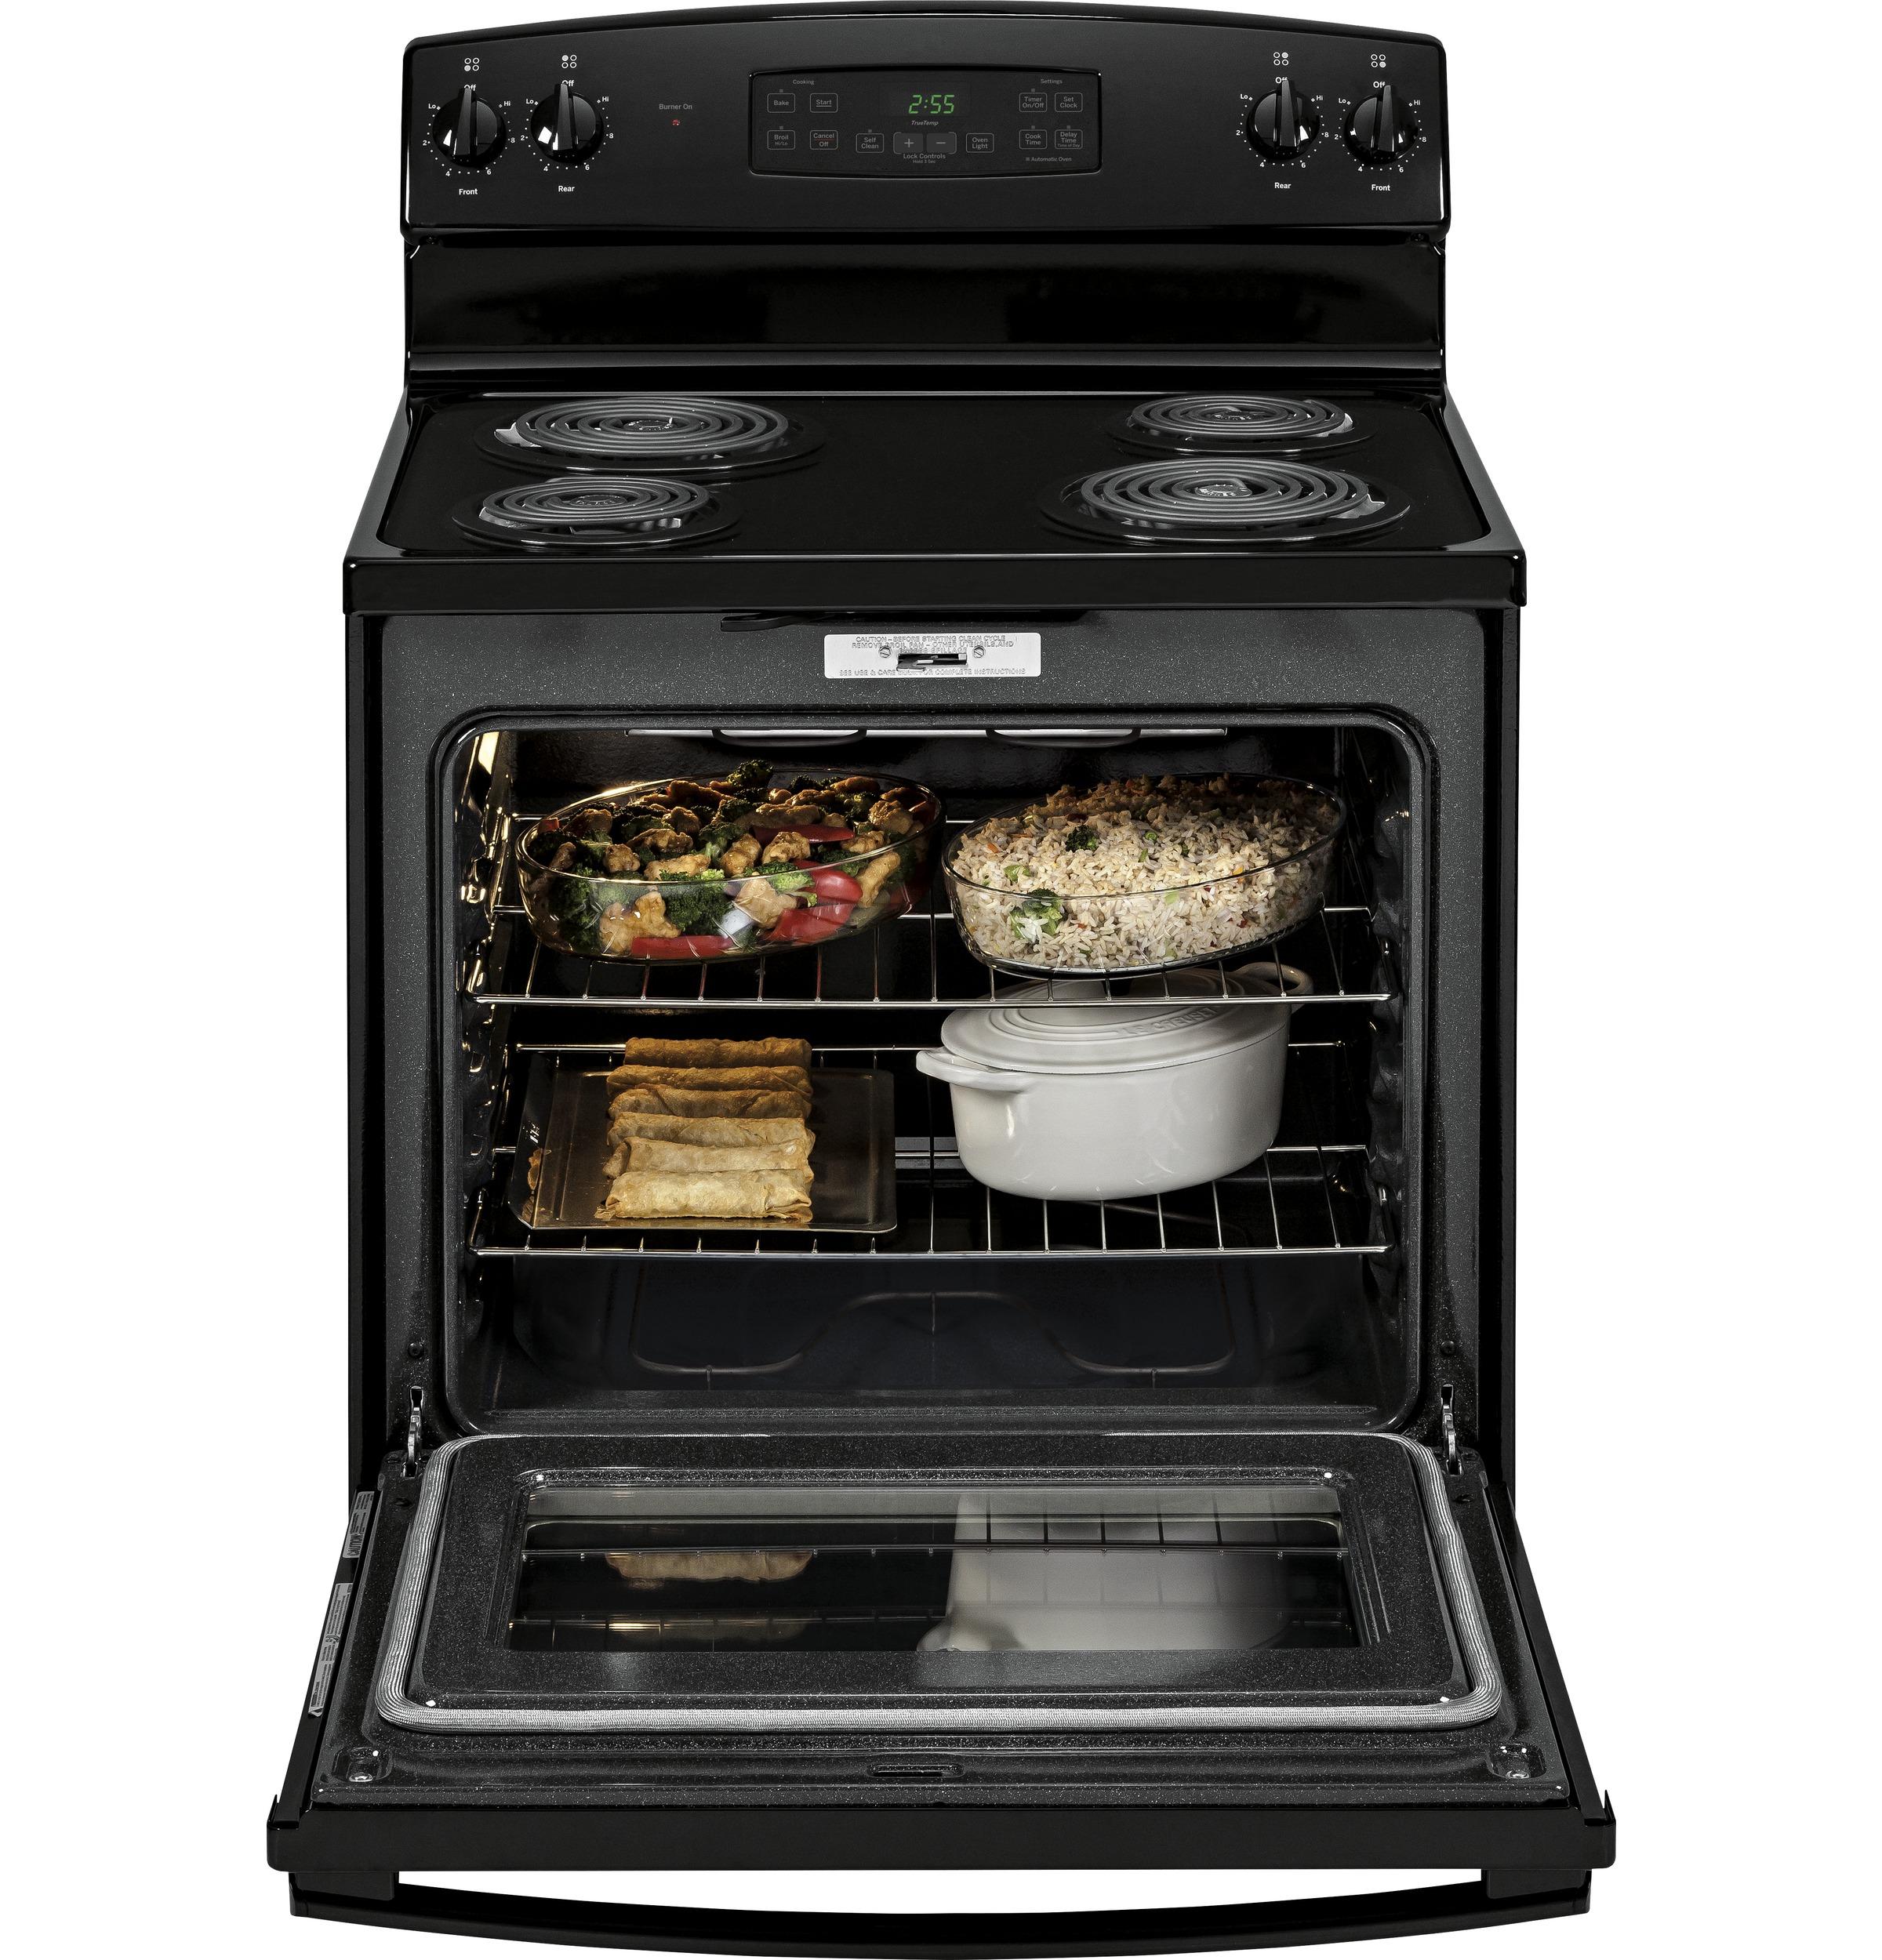 GE Appliances 5.0 cu. ft. Freestanding Electric Range - Black